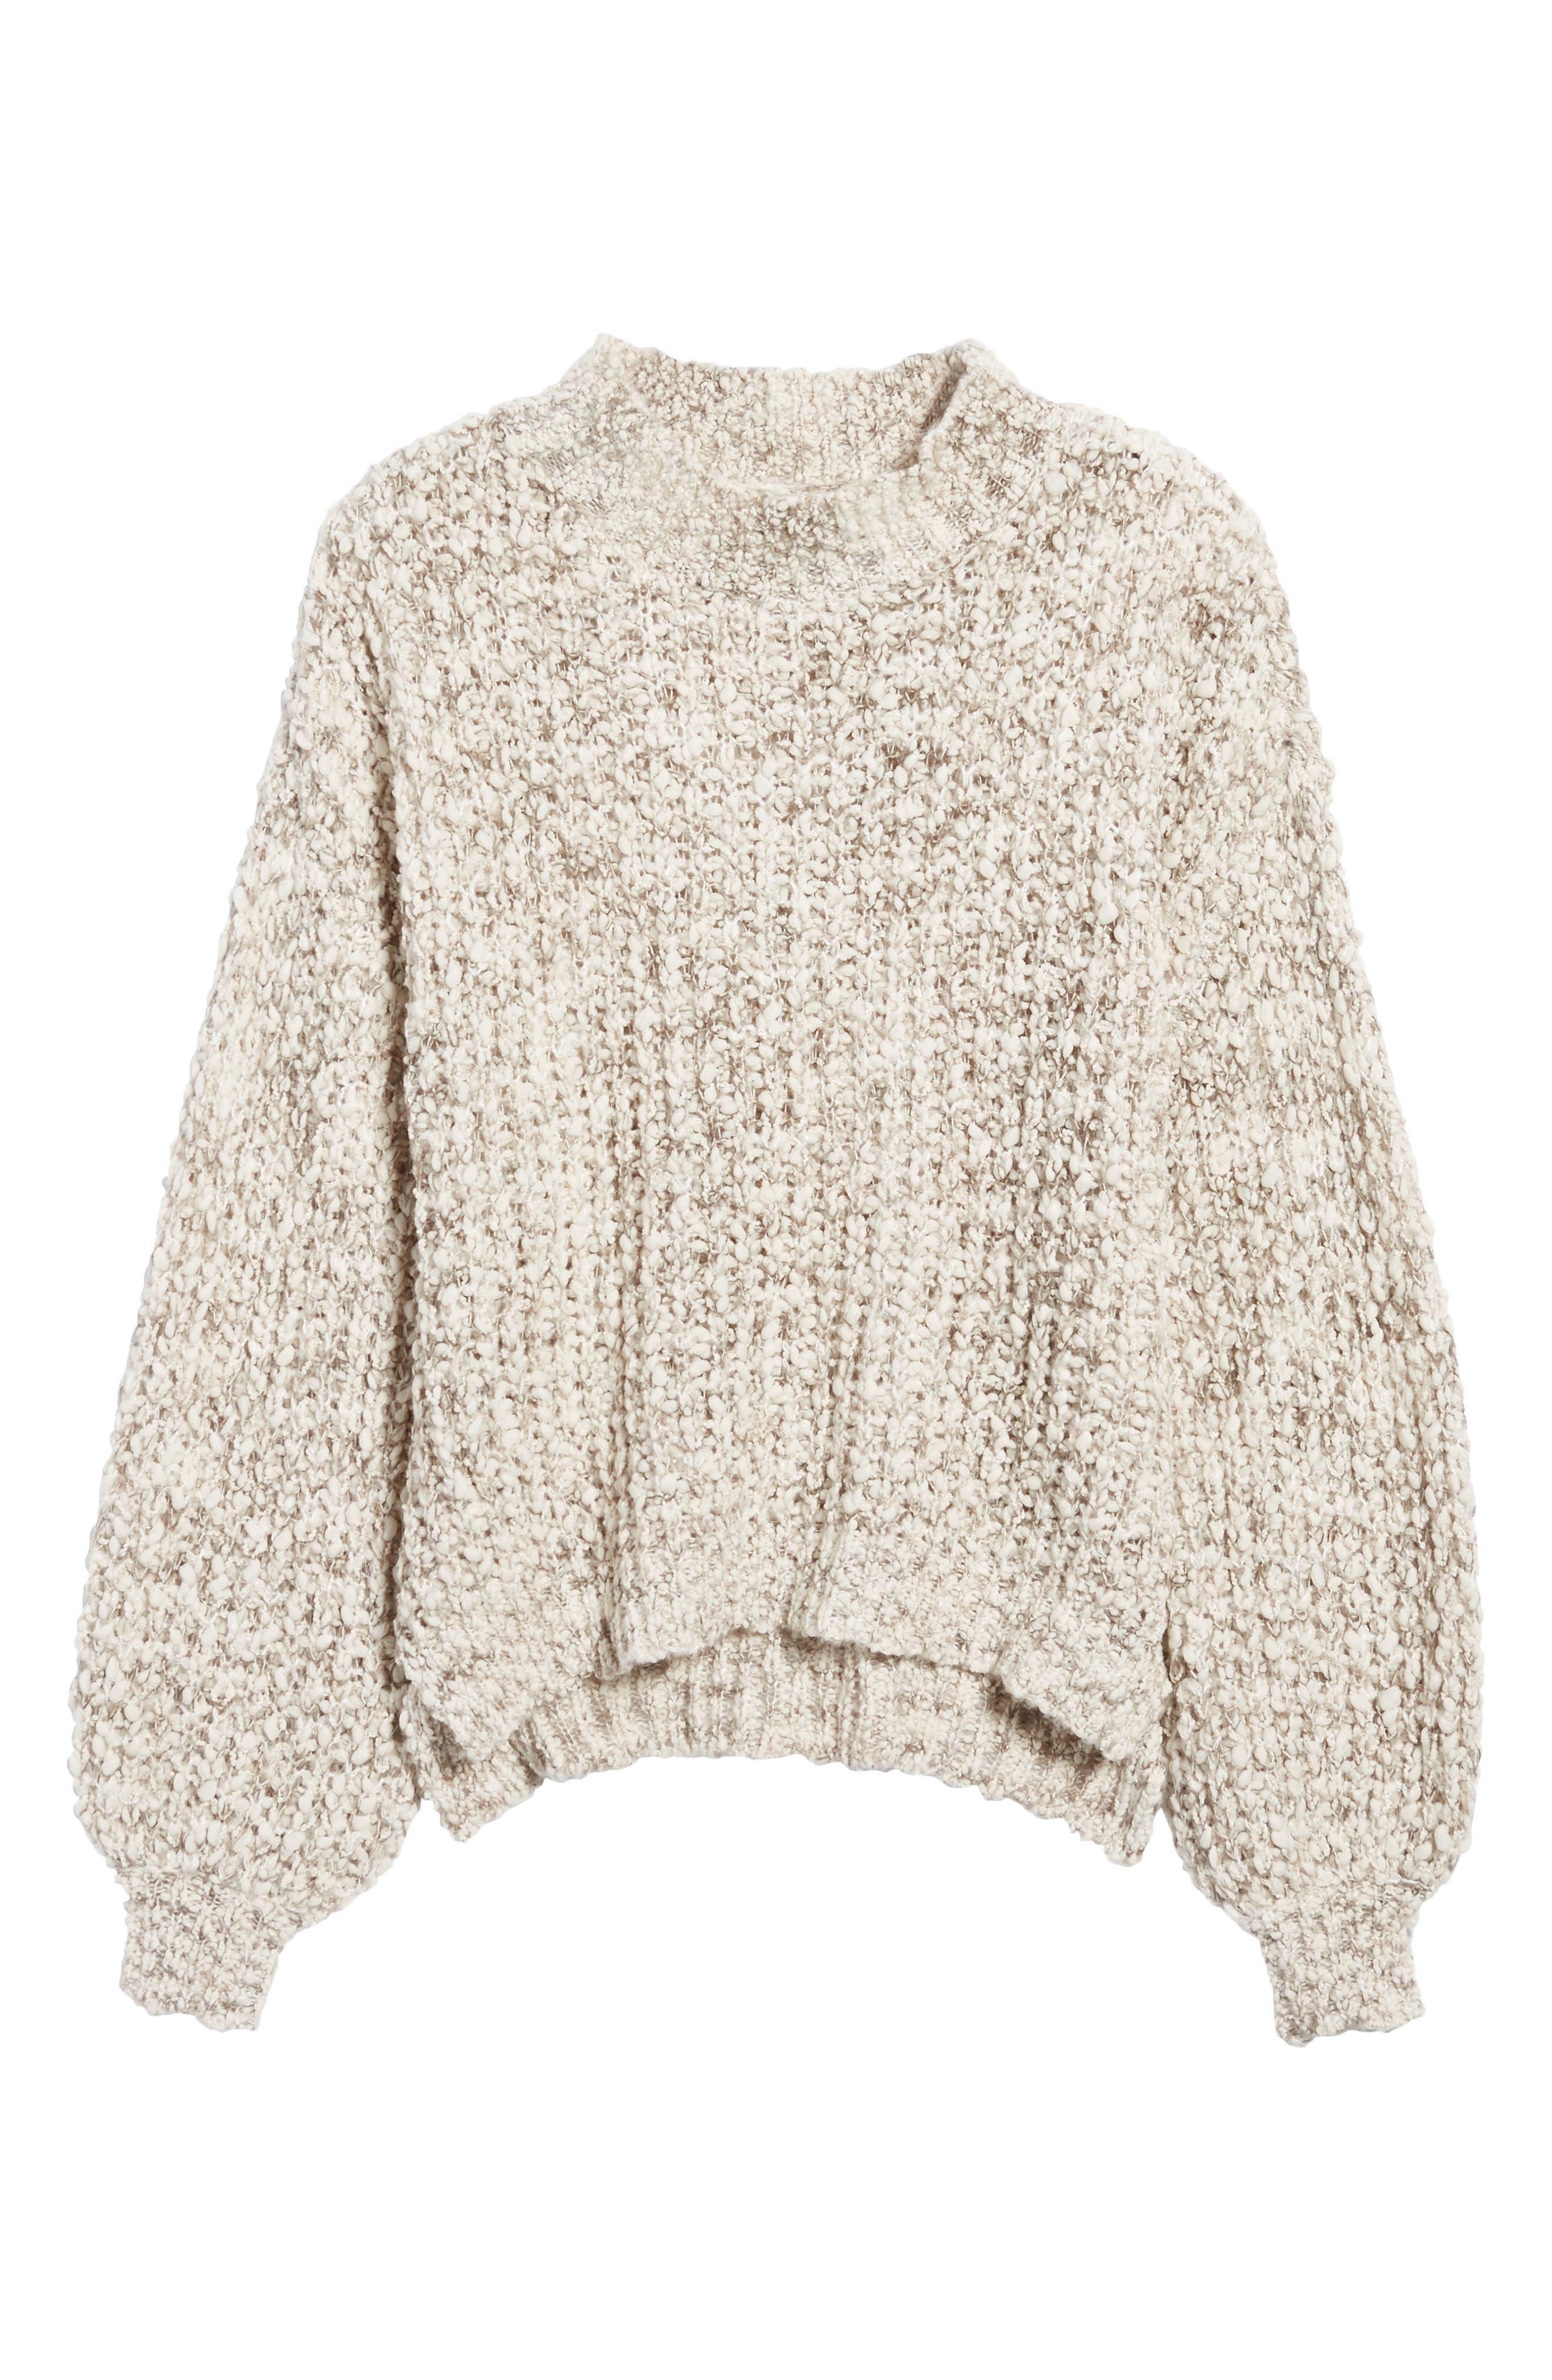 Chunky Knit Mock Neck Sweater,                             Alternate thumbnail 6, color,                             900